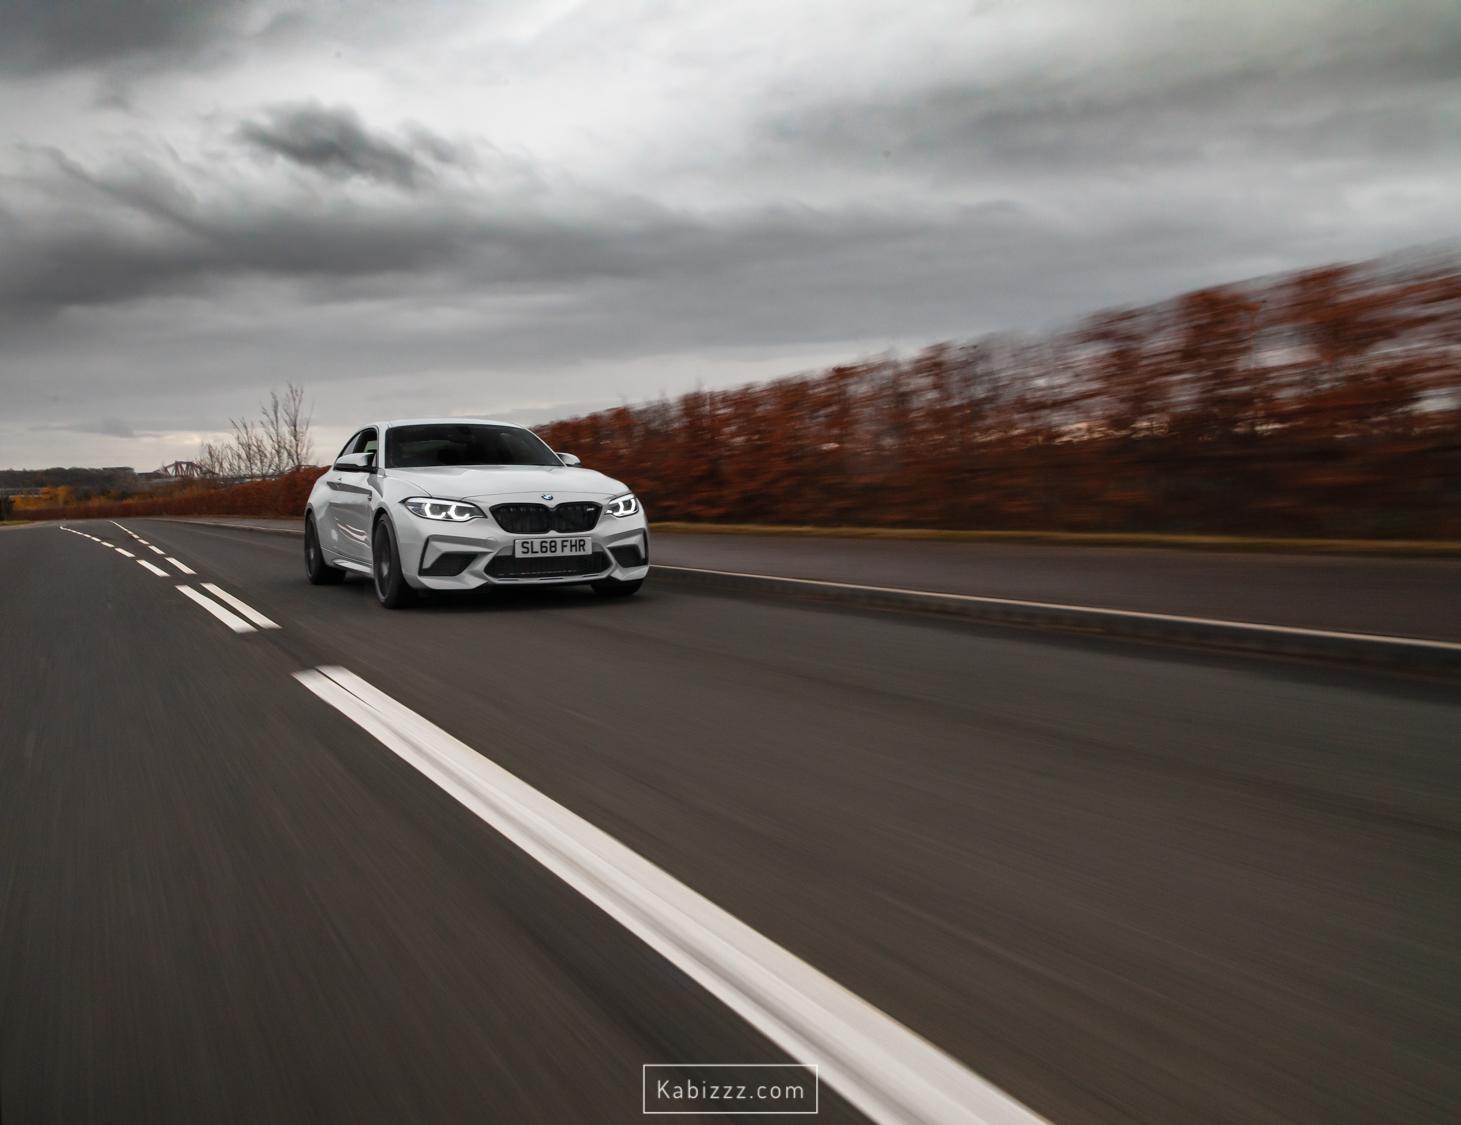 bmw_m2_competition_automotive_photography_kabizzz-5.jpg